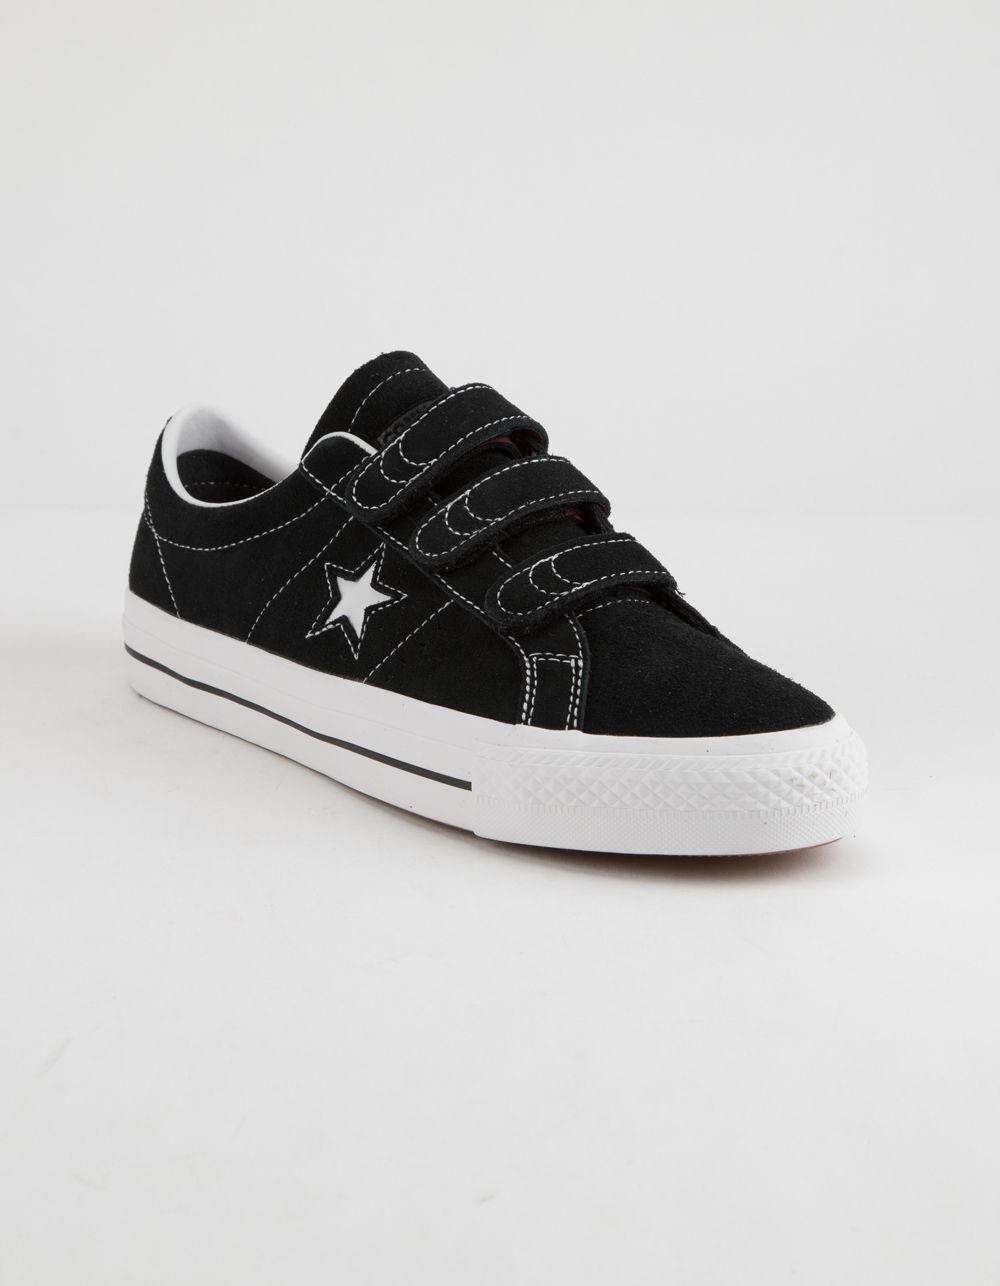 456cbf72ef7281 Lyst - Converse One Star Pro 3v Ox Black   White Shoes in Black for Men